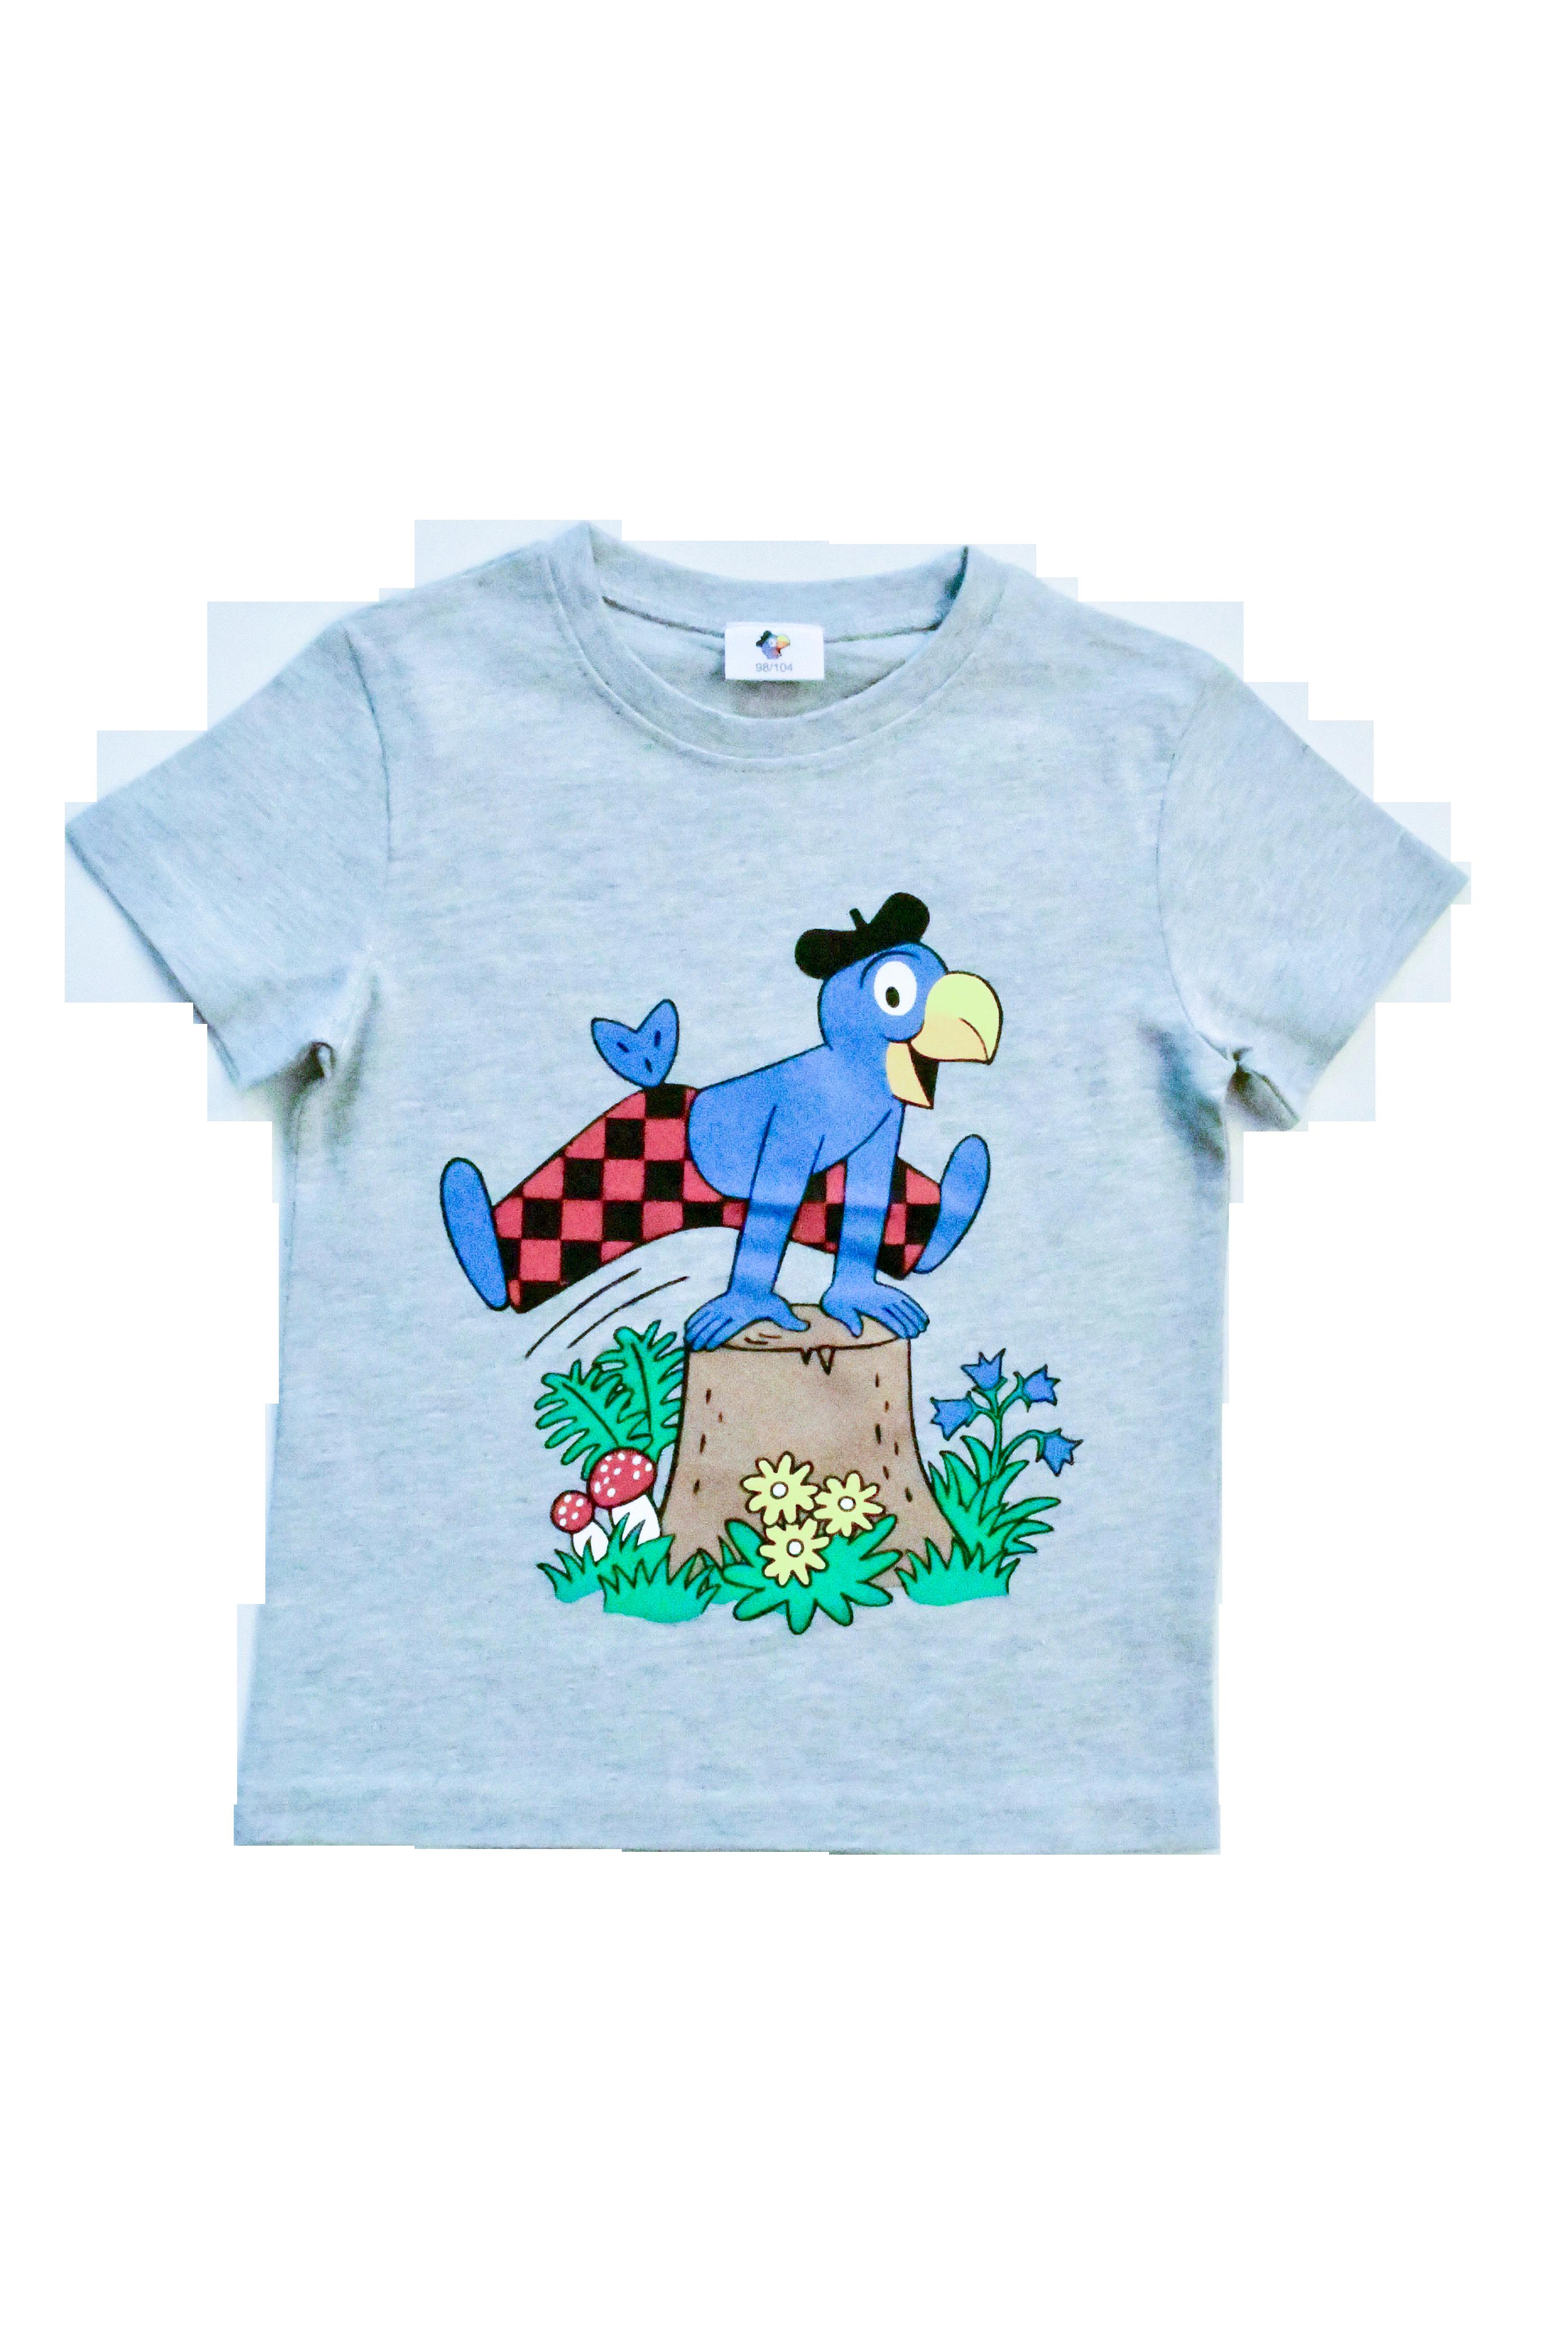 Globi T-Shirt grau Sprung 98/104